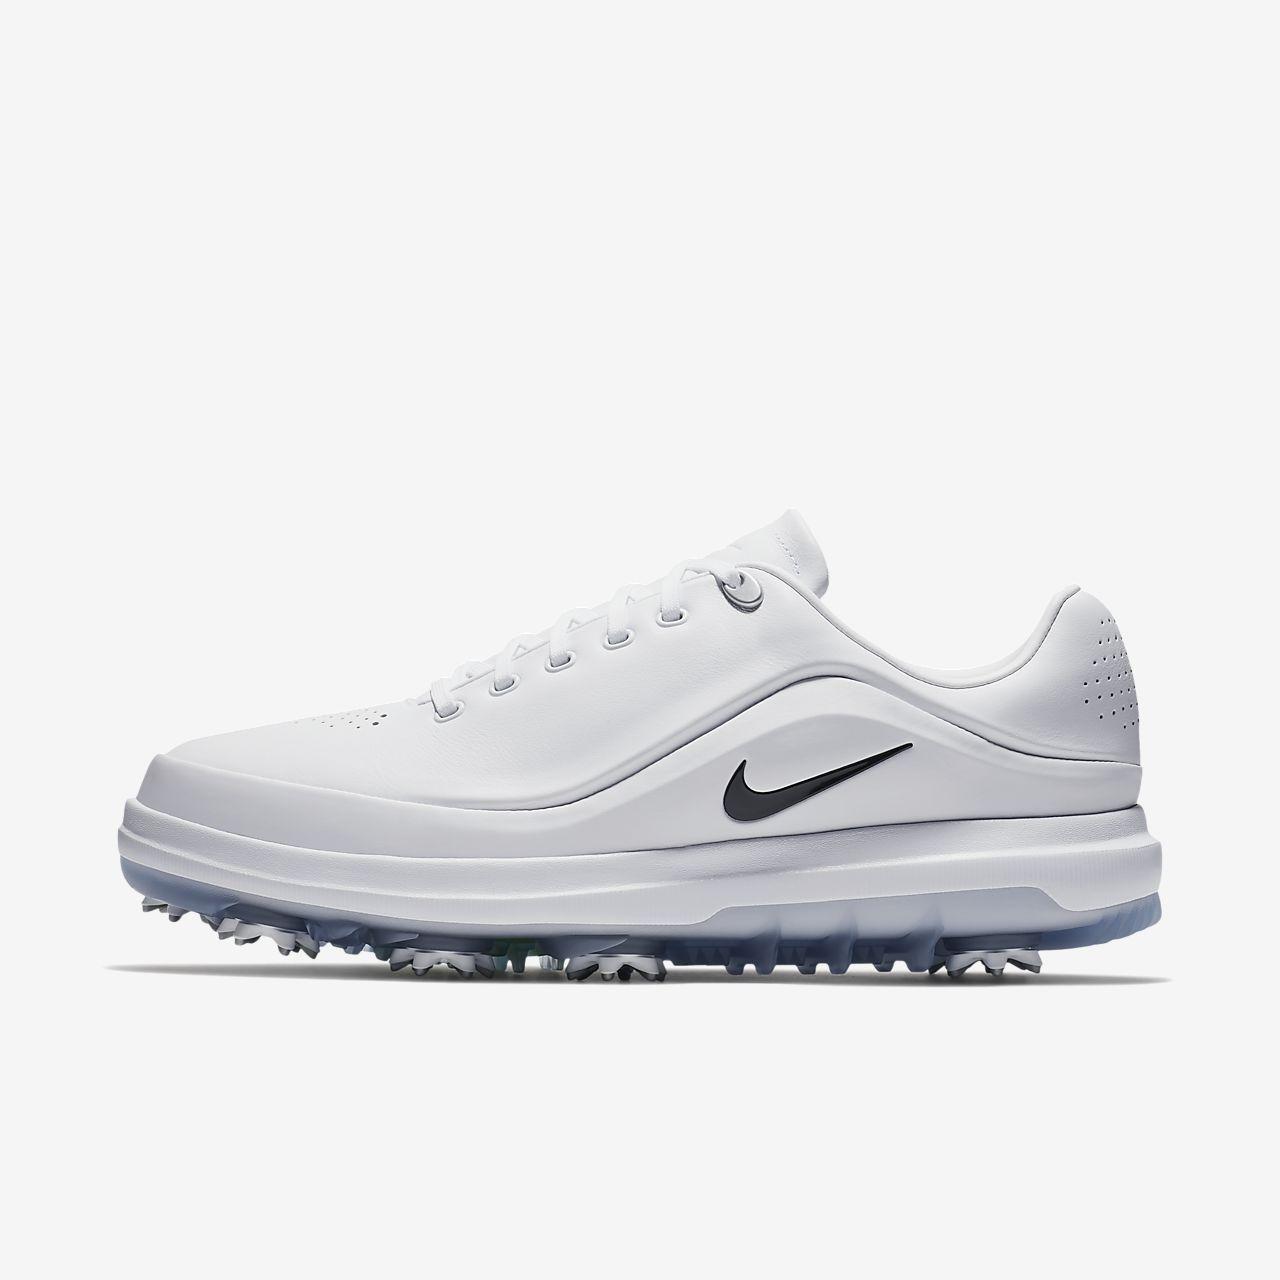 official photos 46d67 497e3 Nike Air Zoom Precision-golfsko til mænd